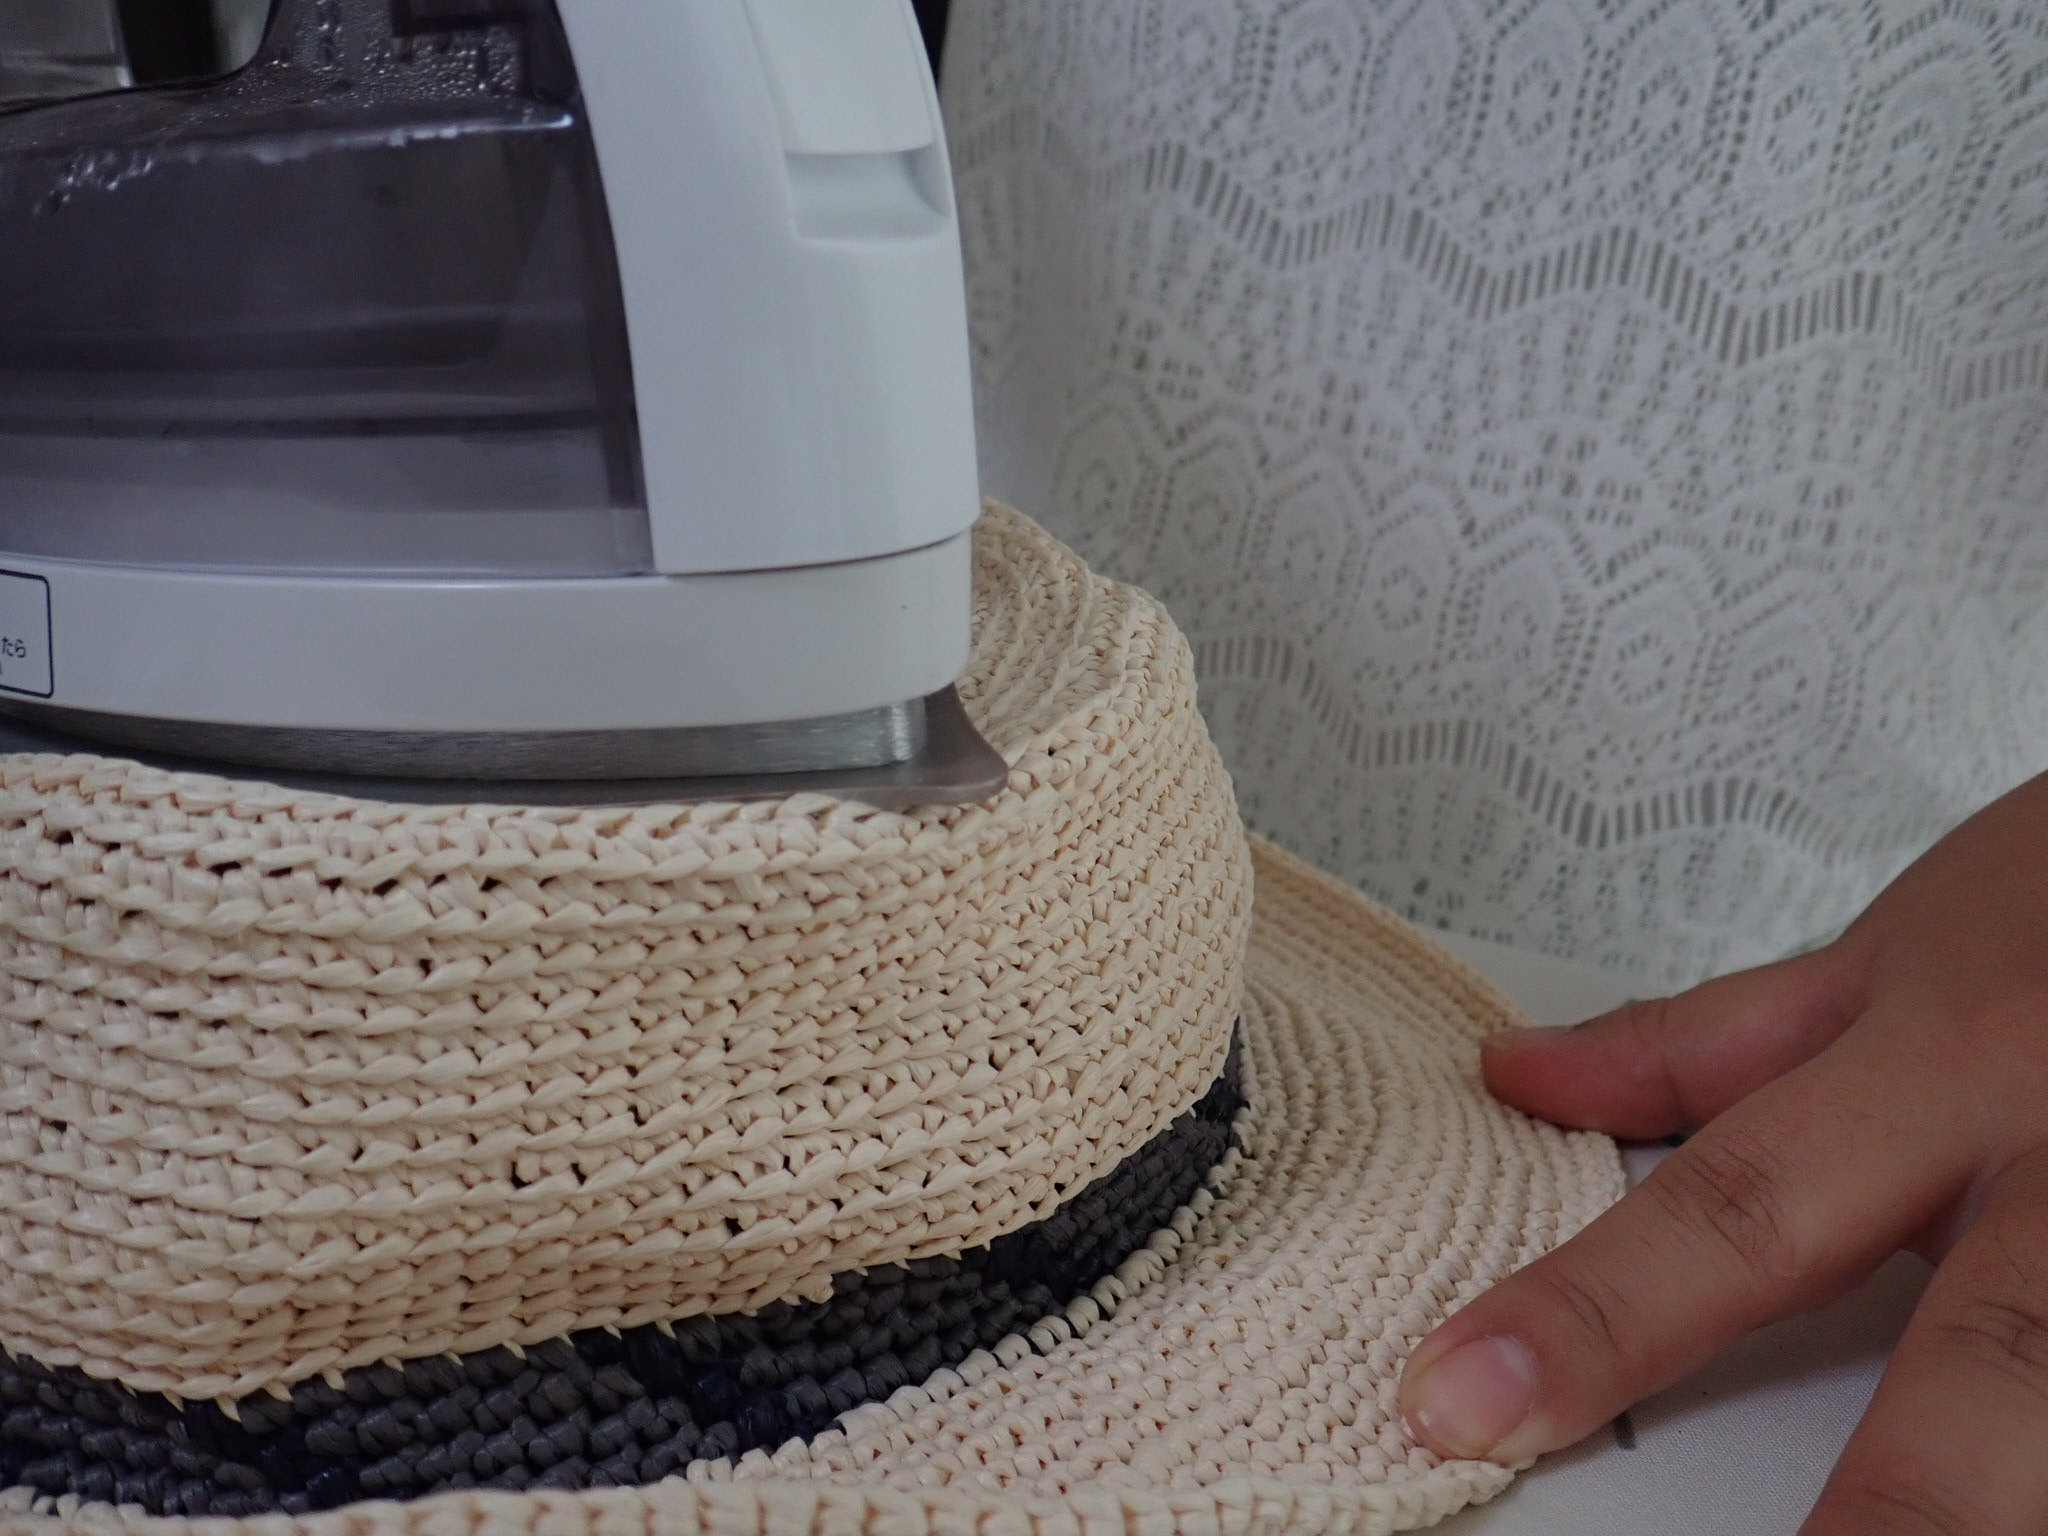 WechatIMG424 - 驚き!ぺしゃんこの帽子が簡単に復活!!一体どうやって!?